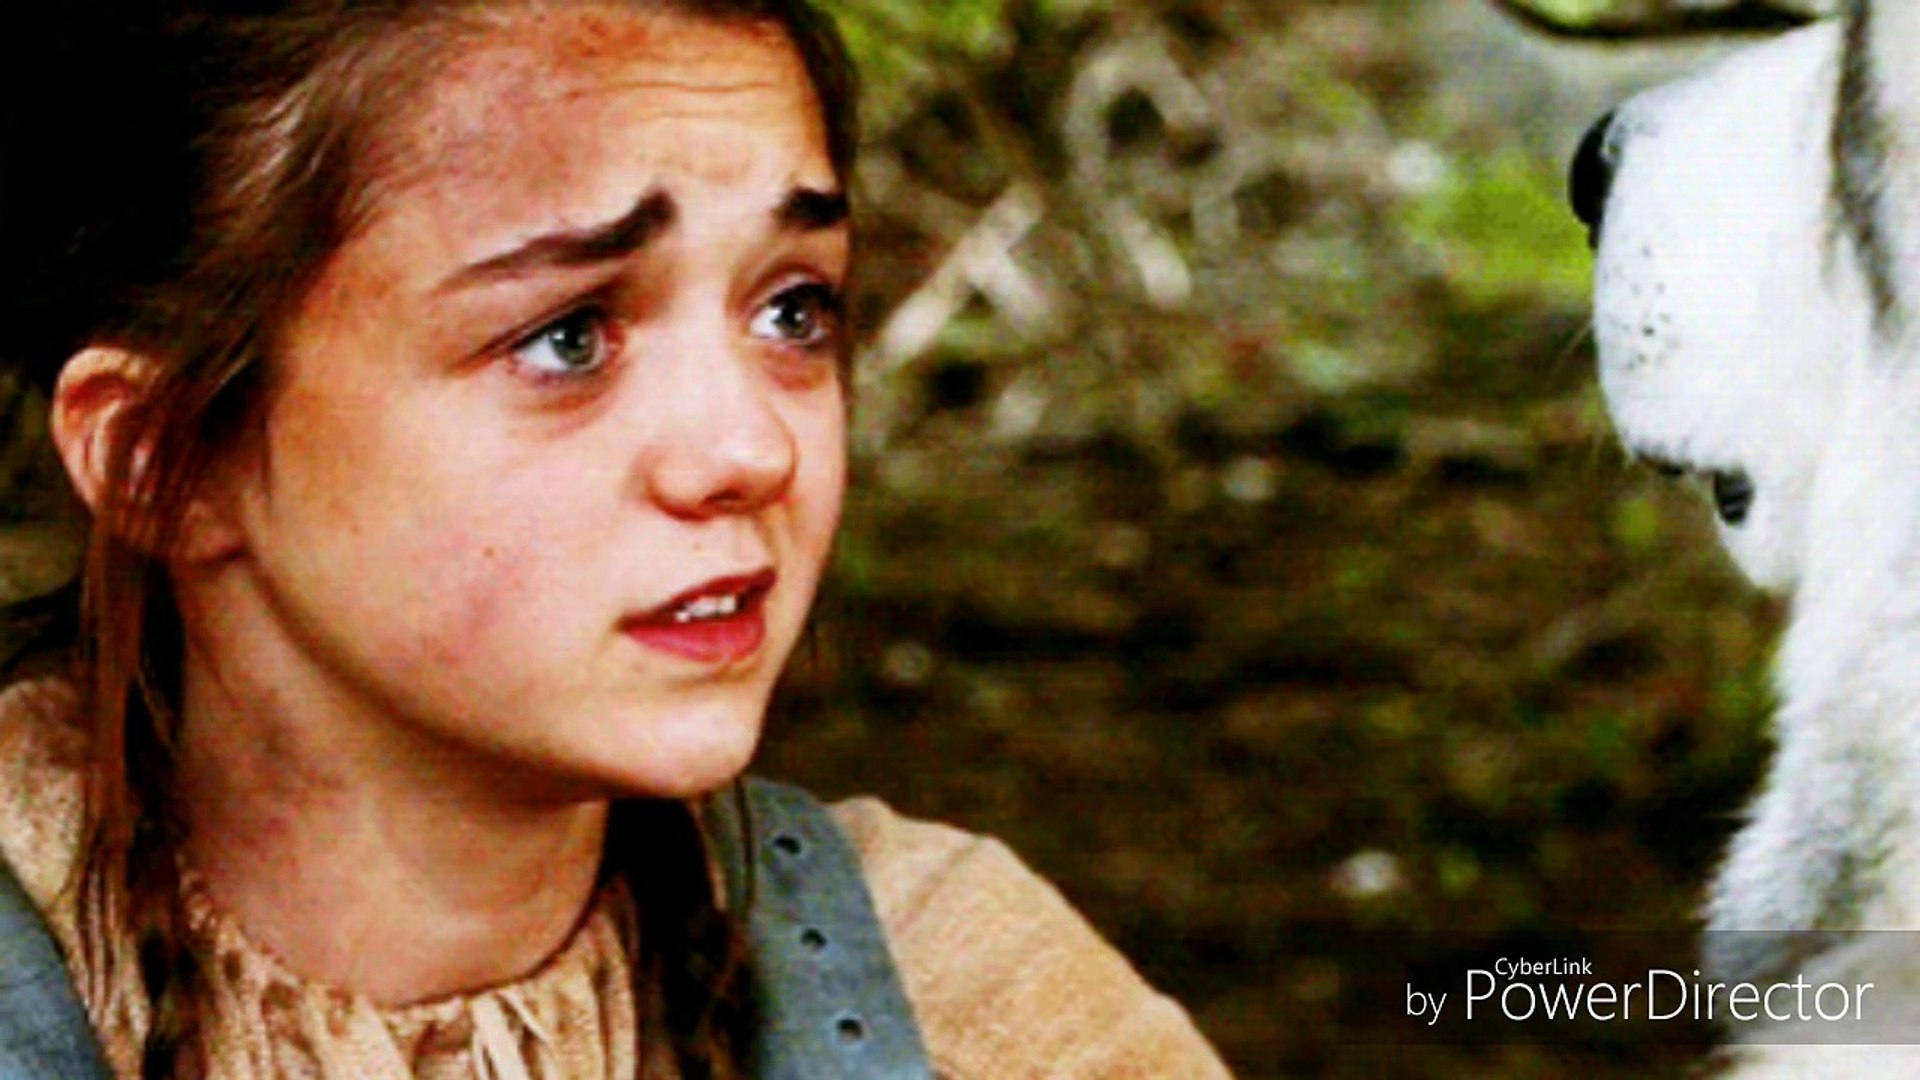 Season 7 Scenes! - Game of Thrones (Season 7 Spoilers)